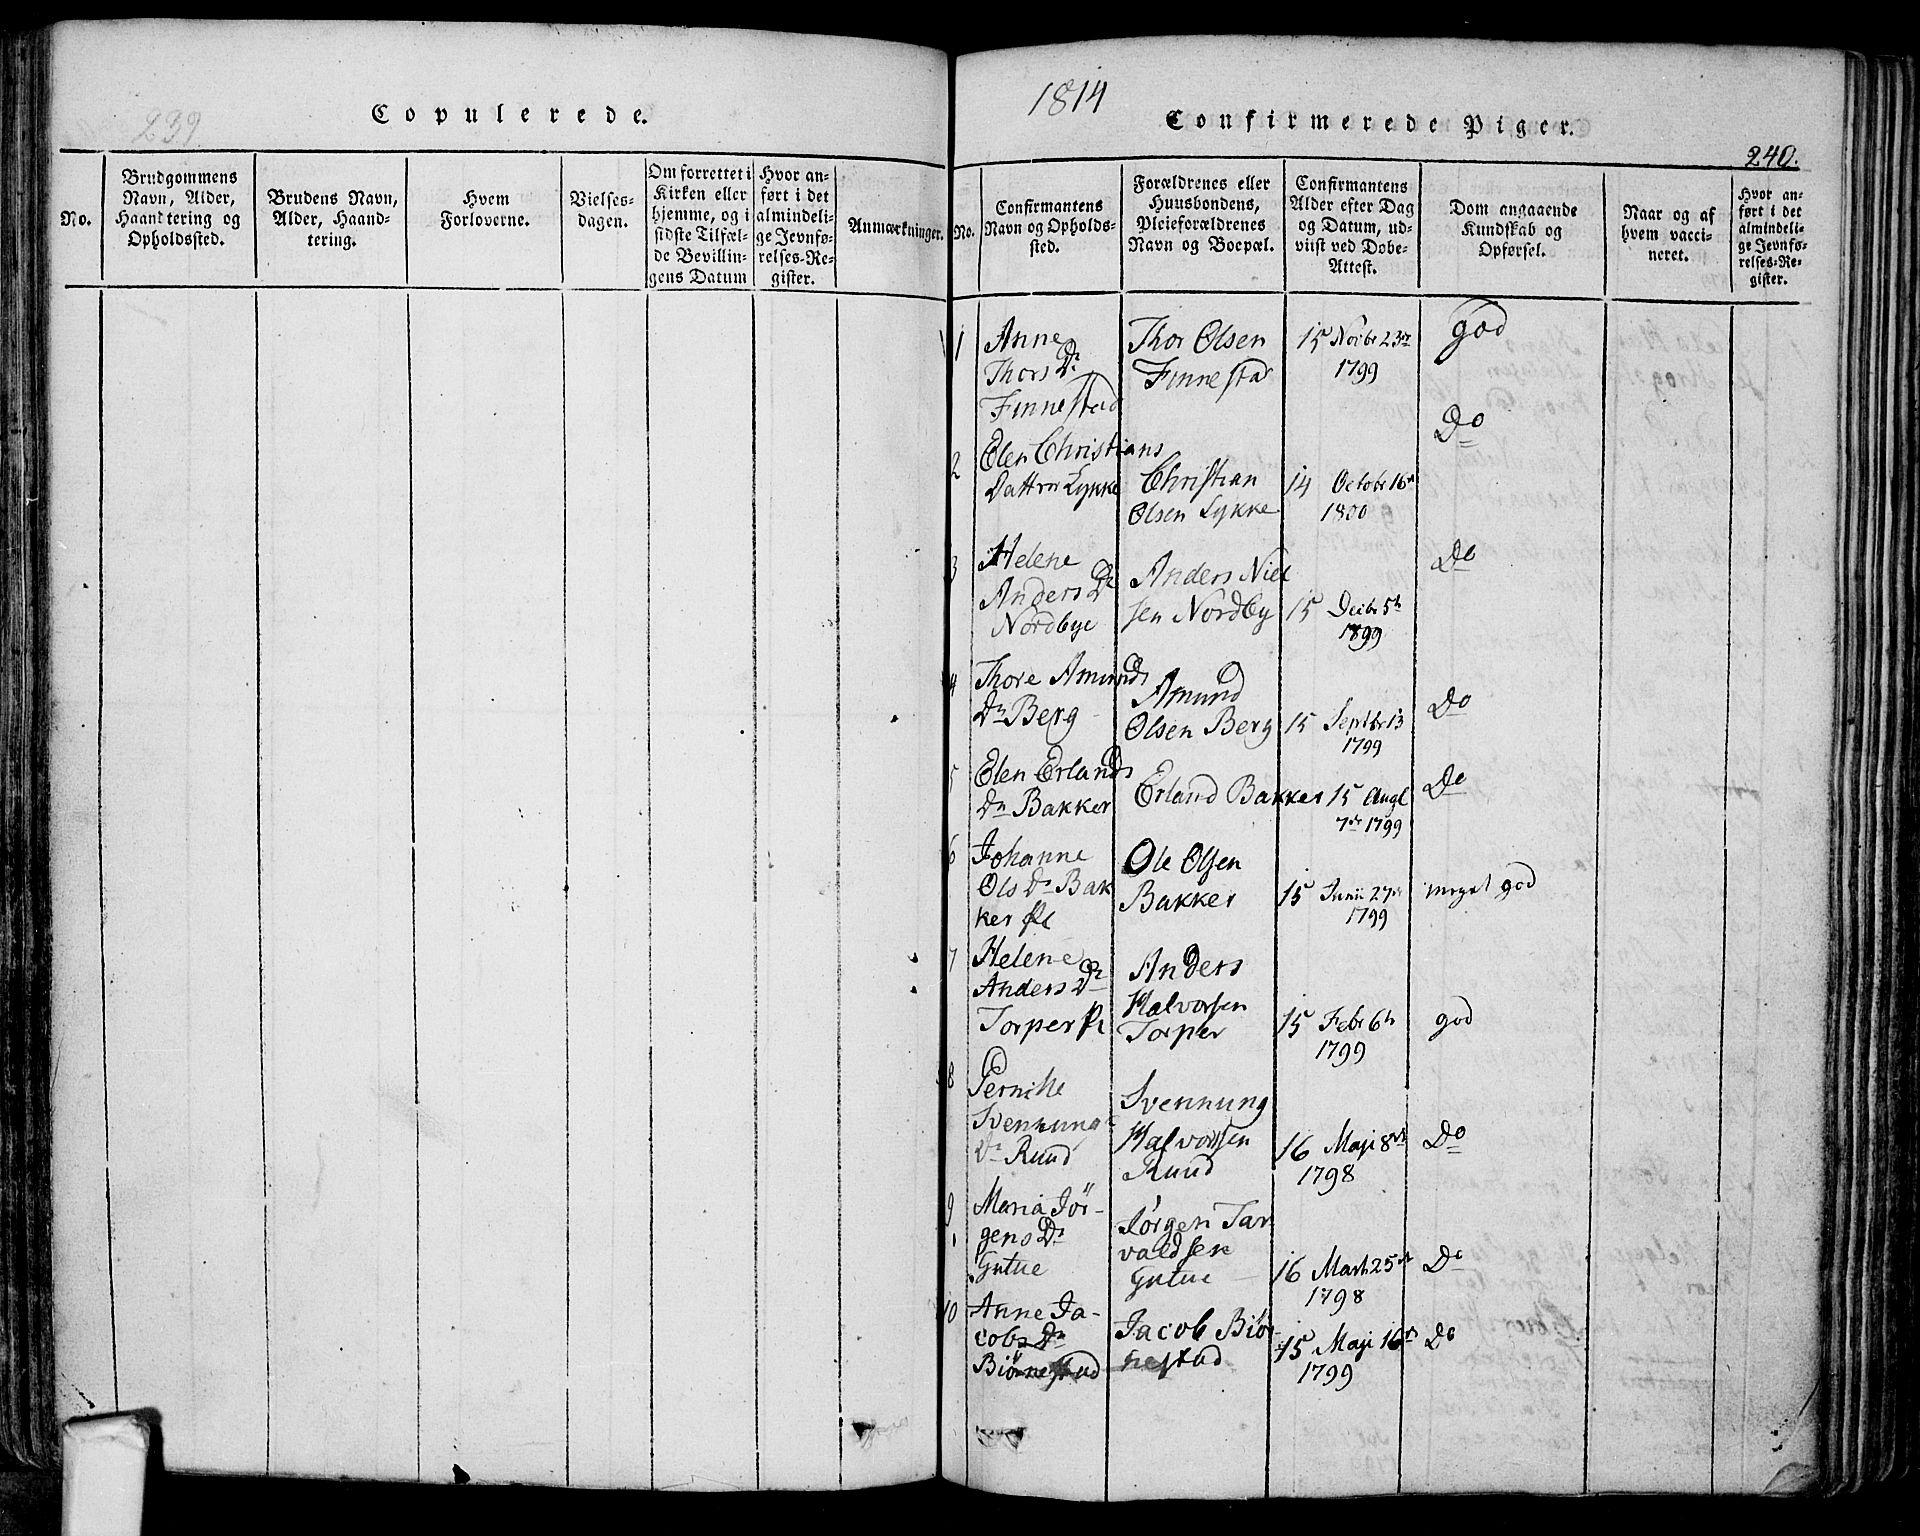 SAO, Eidsberg prestekontor Kirkebøker, F/Fa/L0007: Ministerialbok nr. I 7, 1814-1832, s. 240